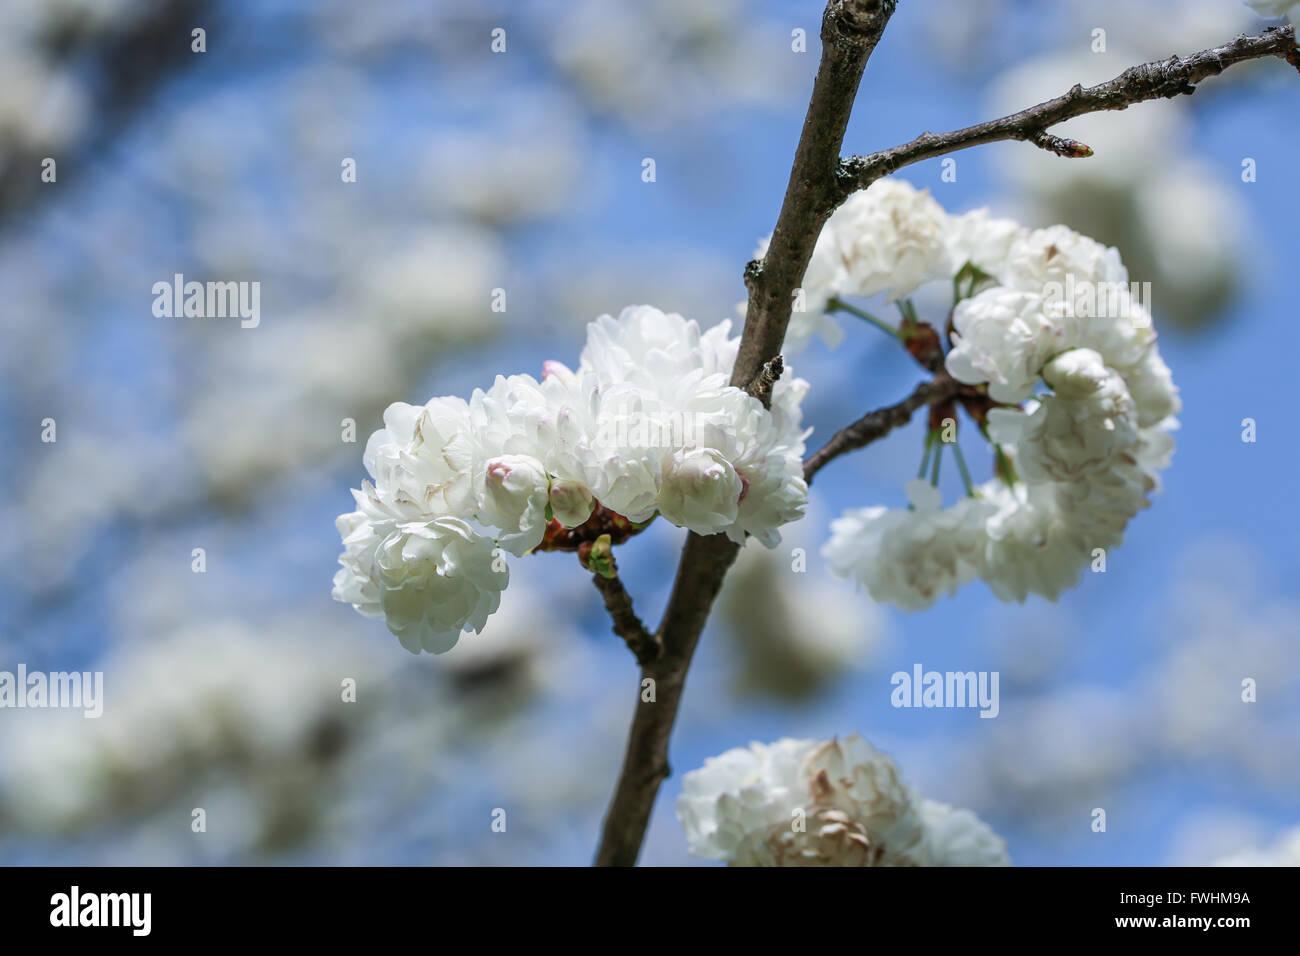 White sakura flowers - Stock Image